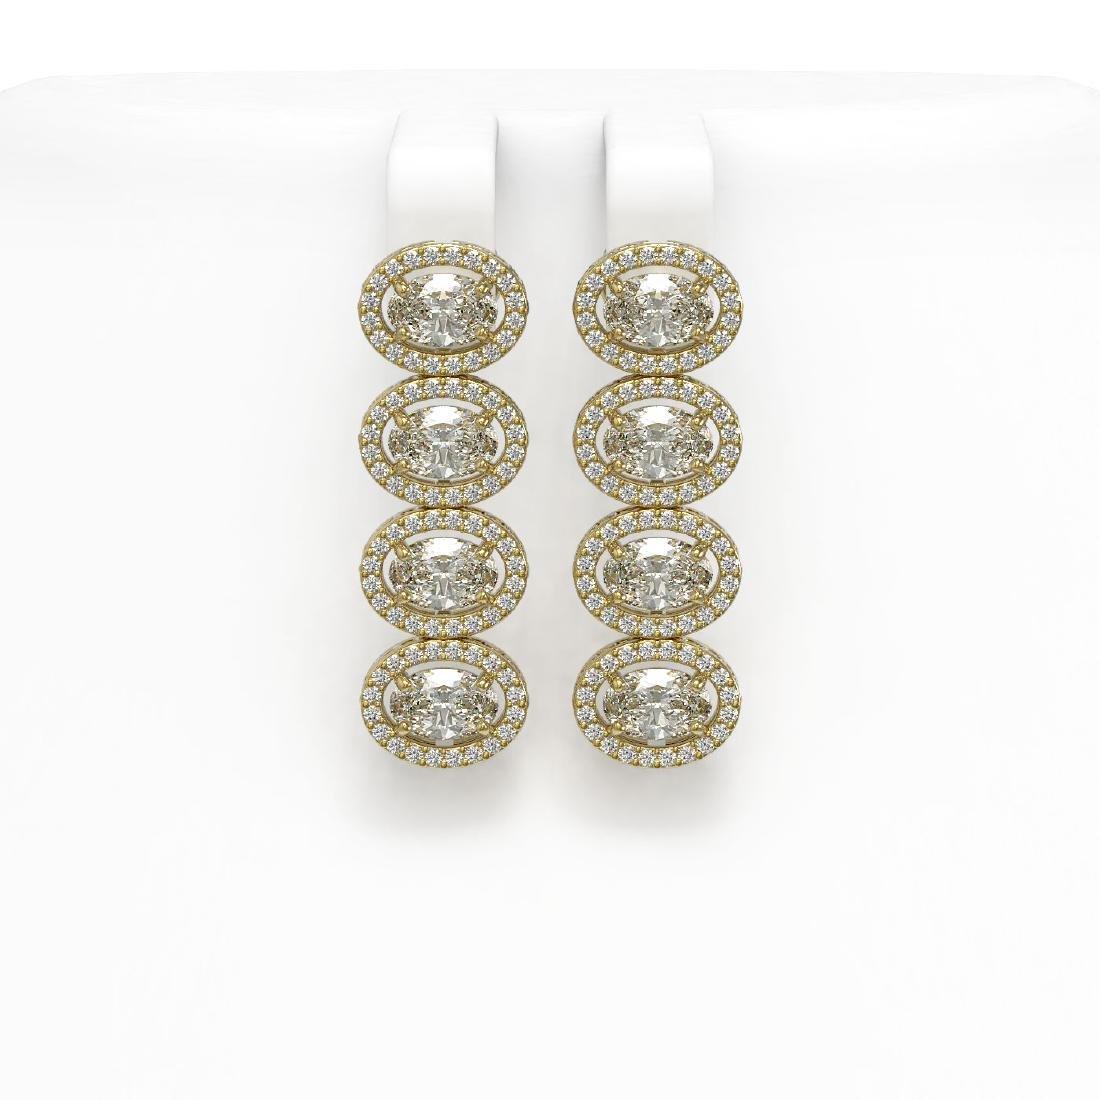 5.33 CTW Oval Diamond Designer Earrings 18K Yellow Gold